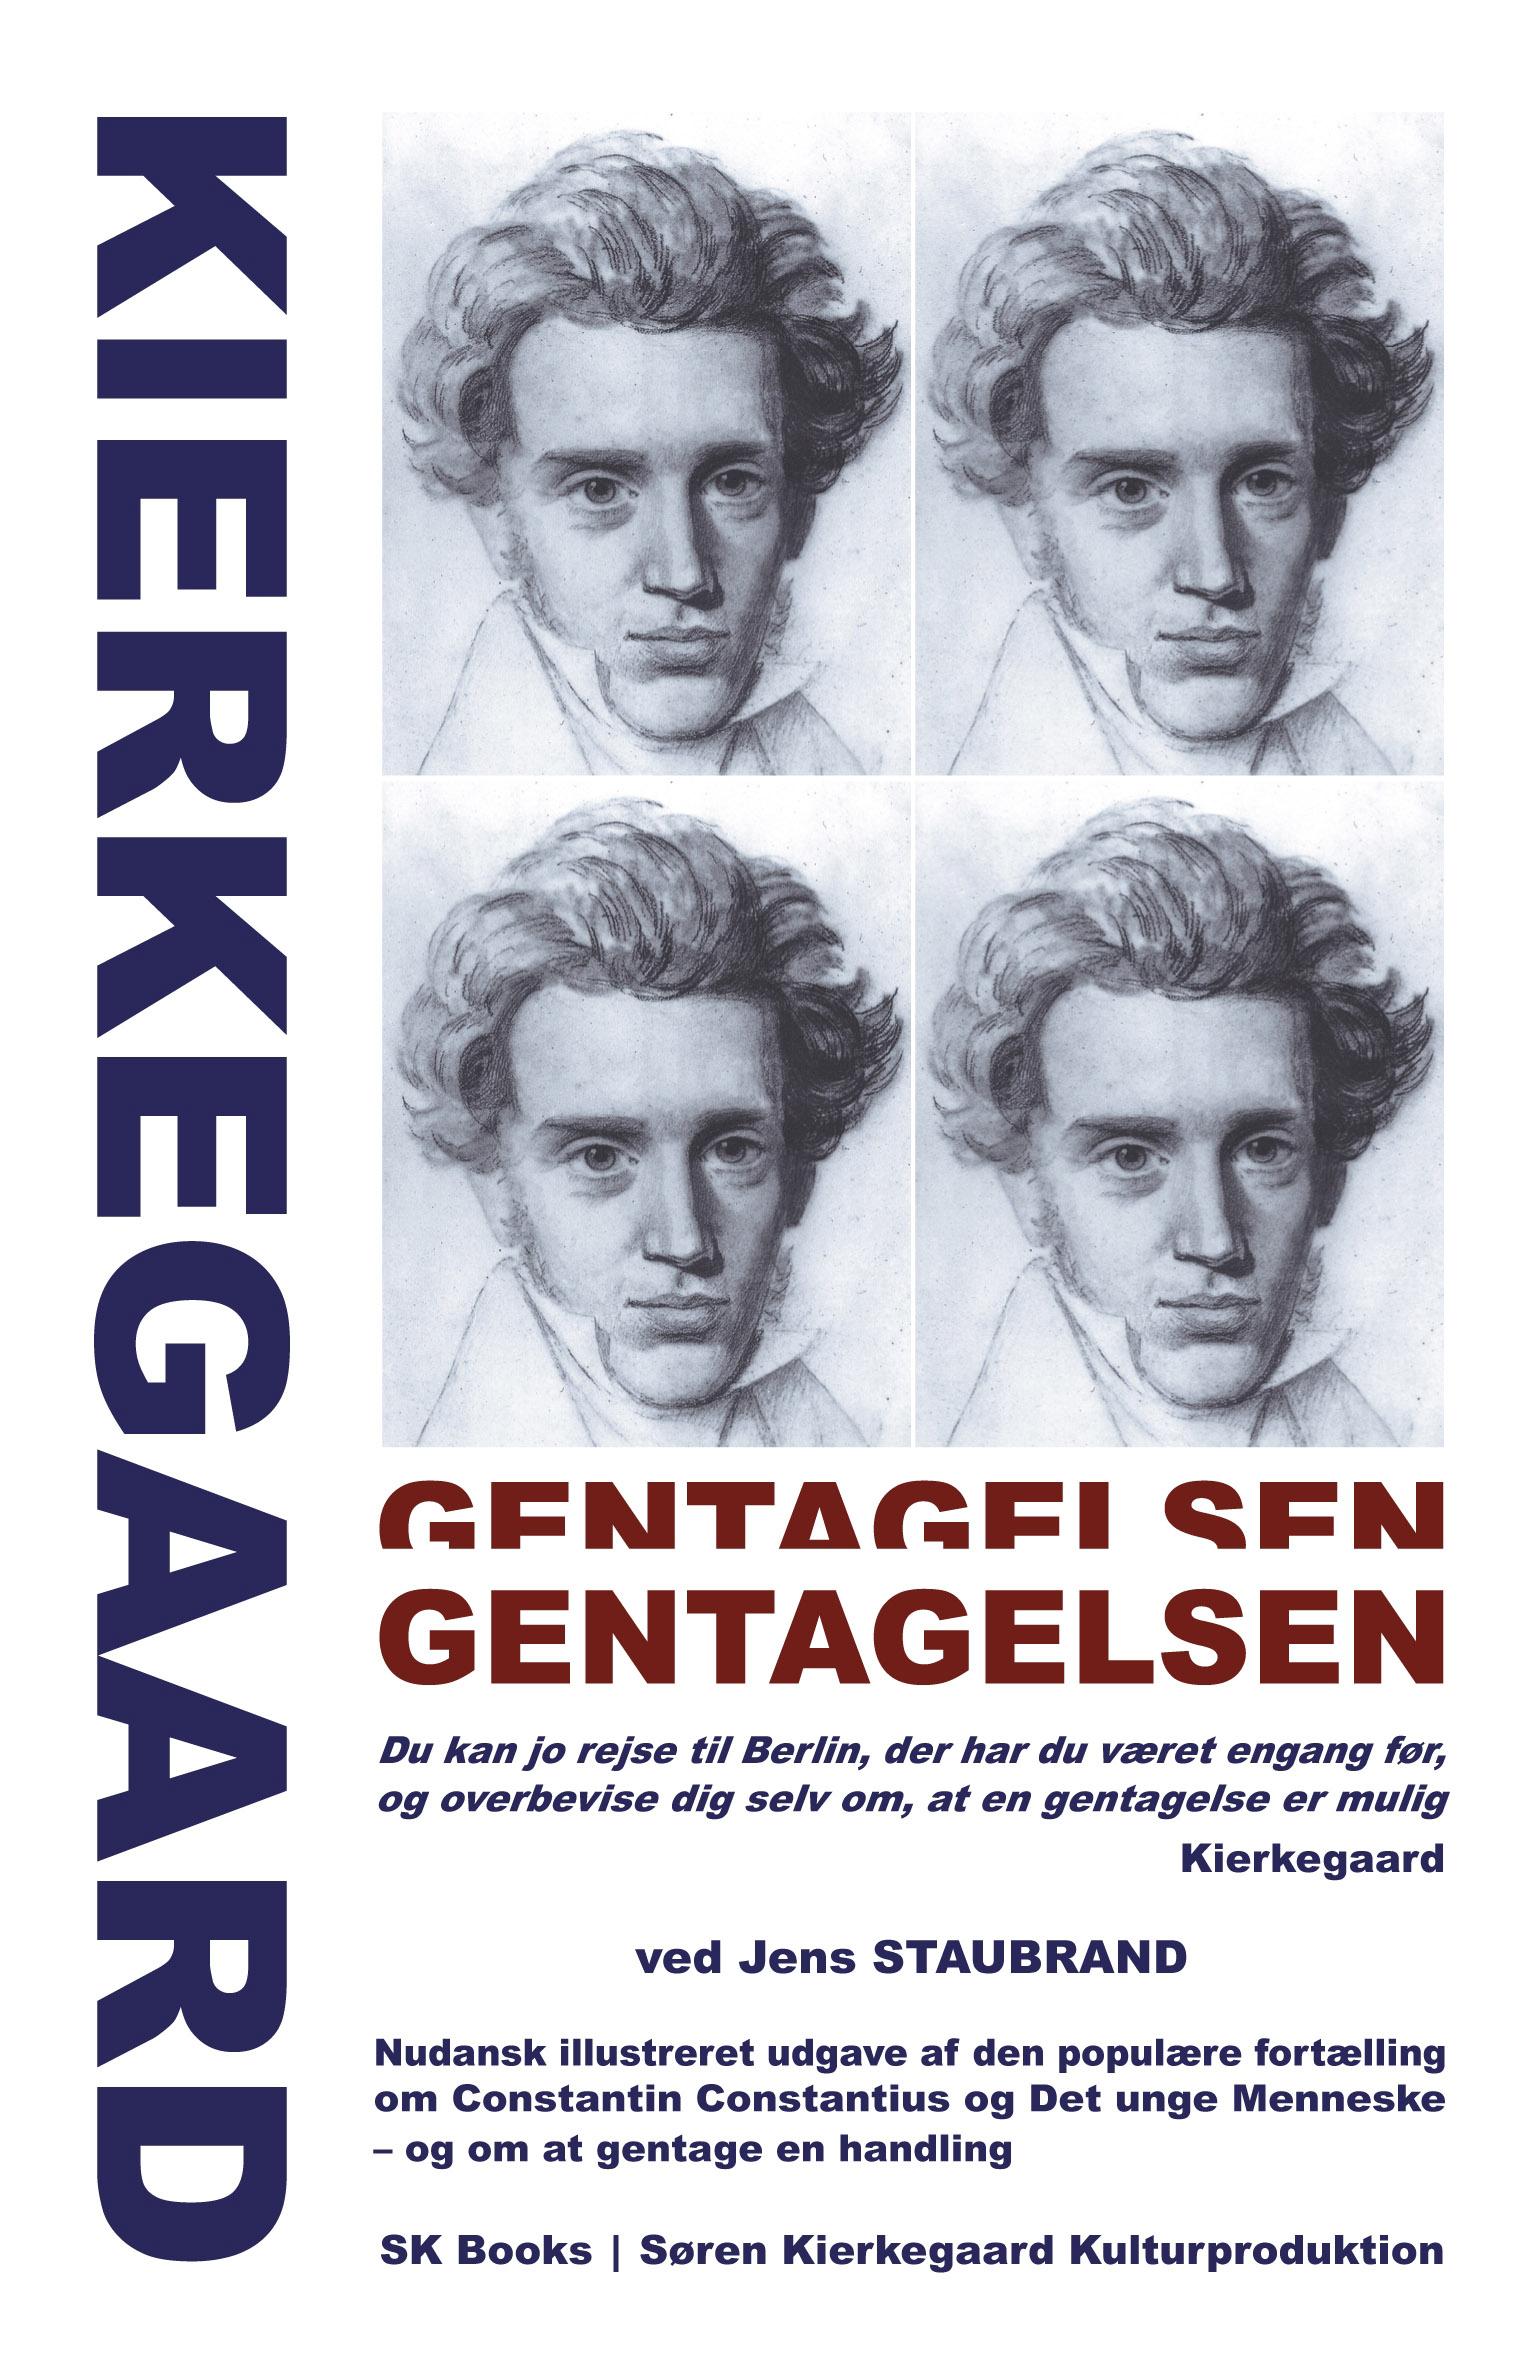 KIERKEGAARD Gentagelsen-Gentagelsen, ved Jens Staubrand